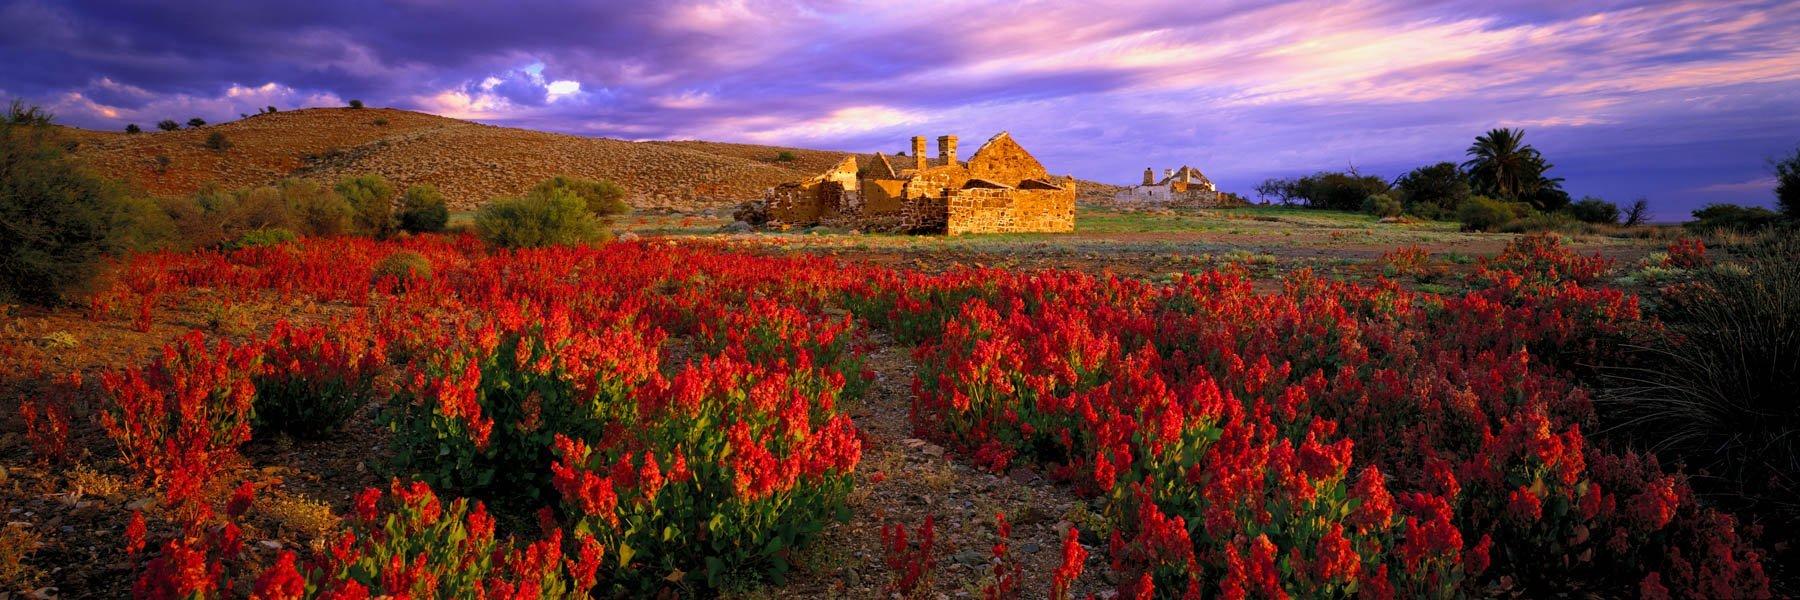 Wildflowers in front of the ruins of Peake Homestead, SA, Australia.